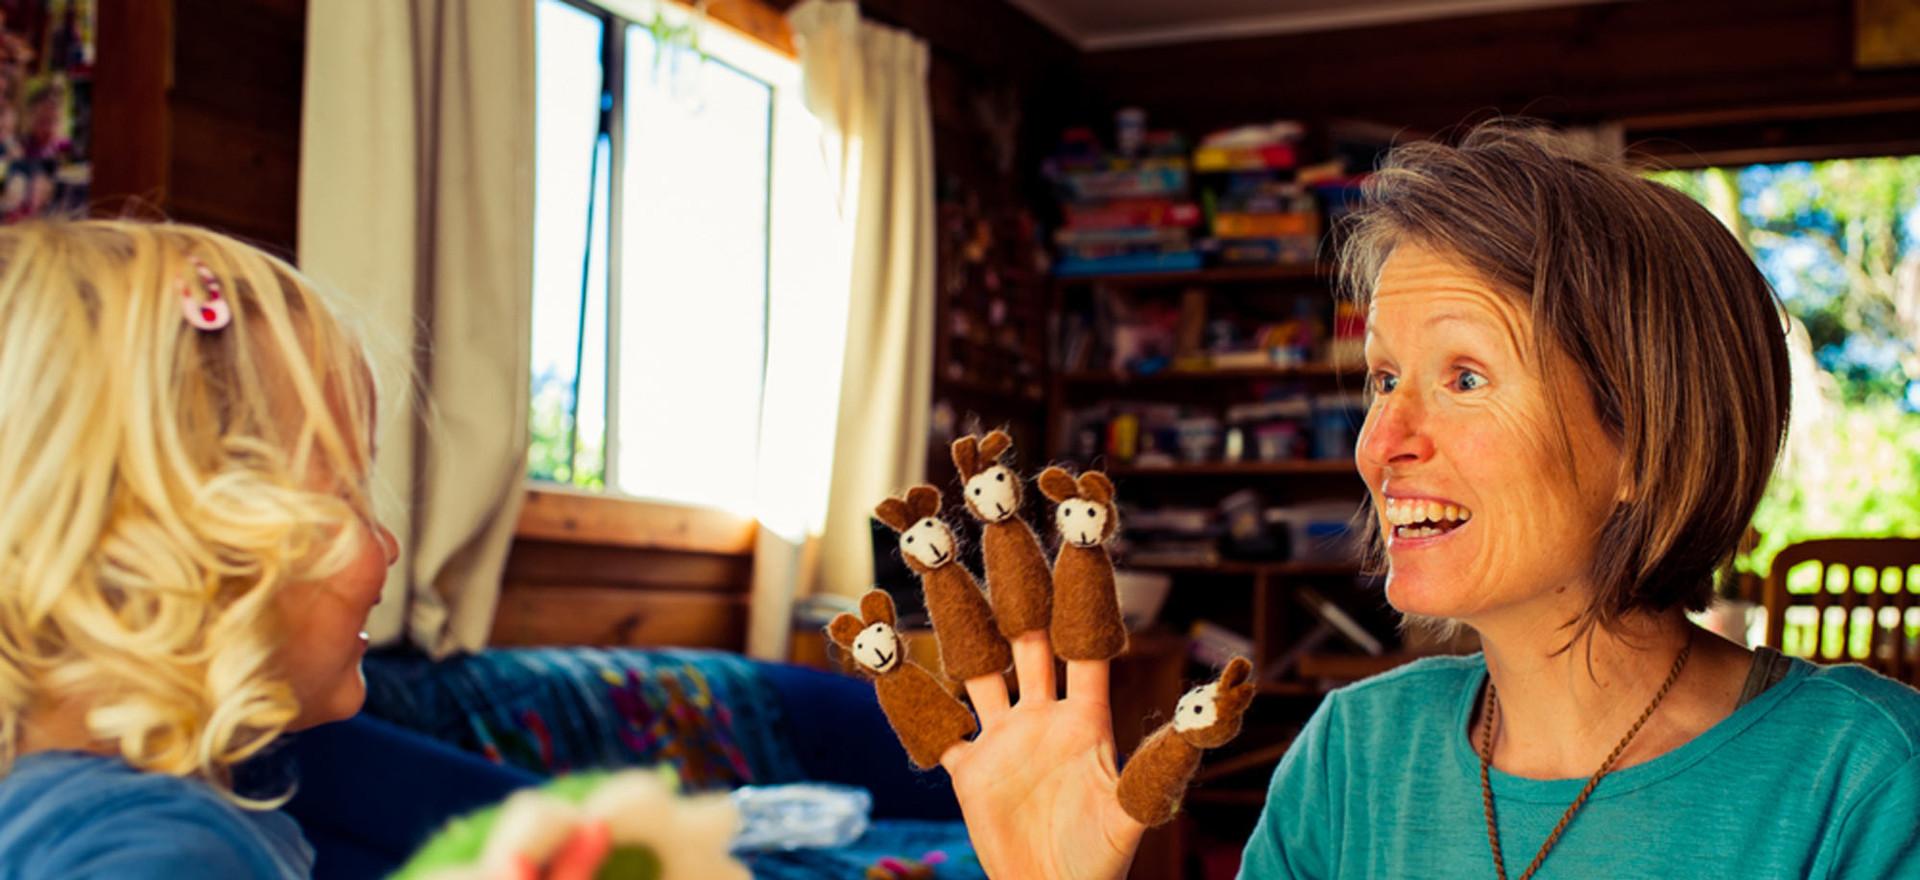 mum-plays-puppets-josie-gritten-photogra